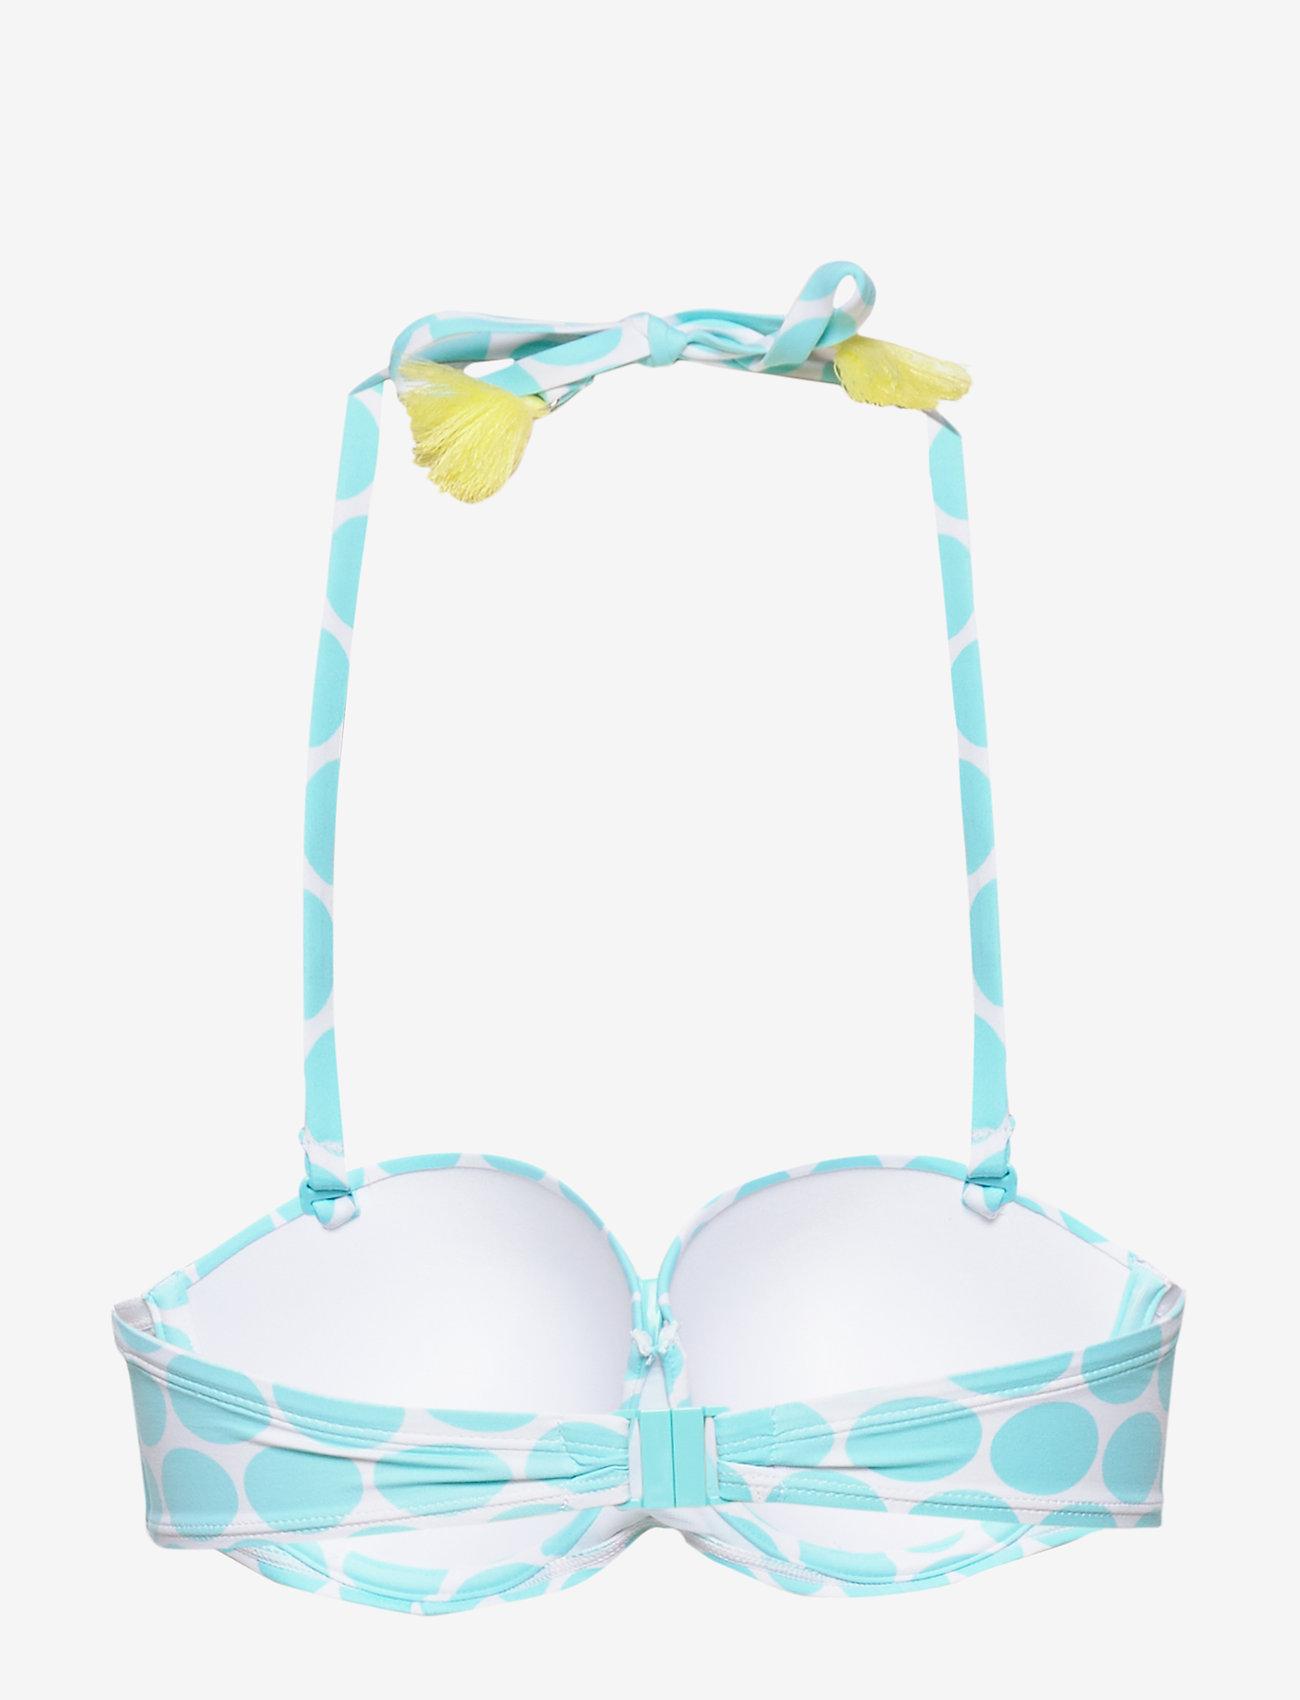 Beach Tops With Wire (Light Aqua Green) (39.99 €) - Esprit Bodywear Women KzdlEnv3